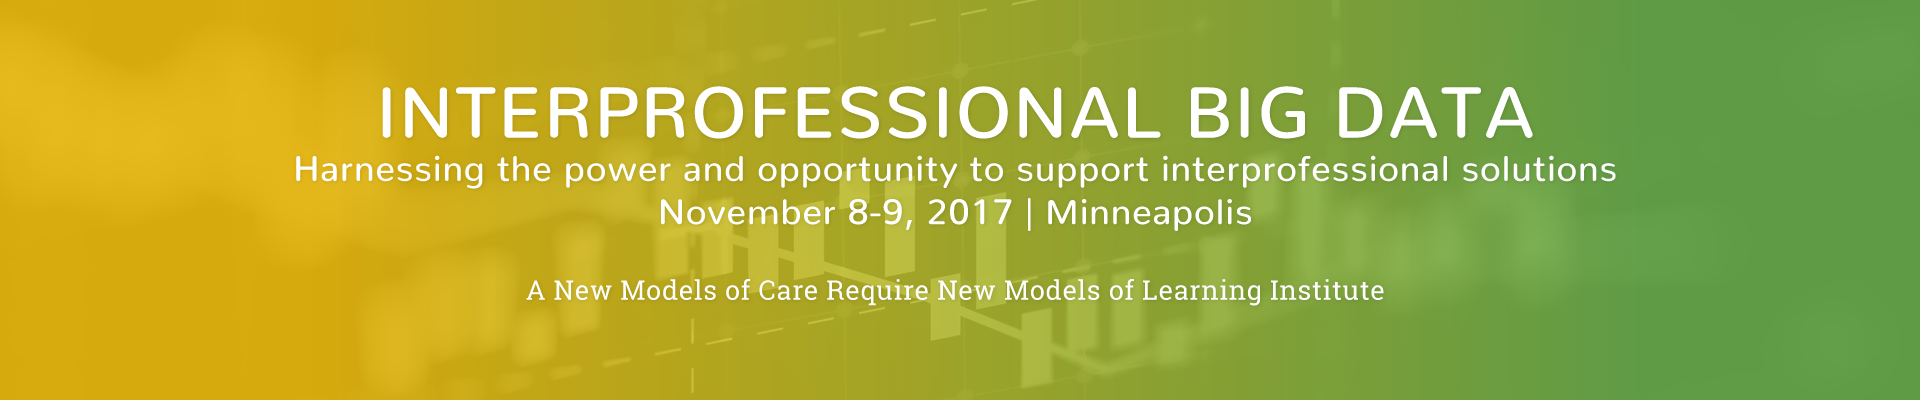 Interprofessional Big Data - November 8-9 2017